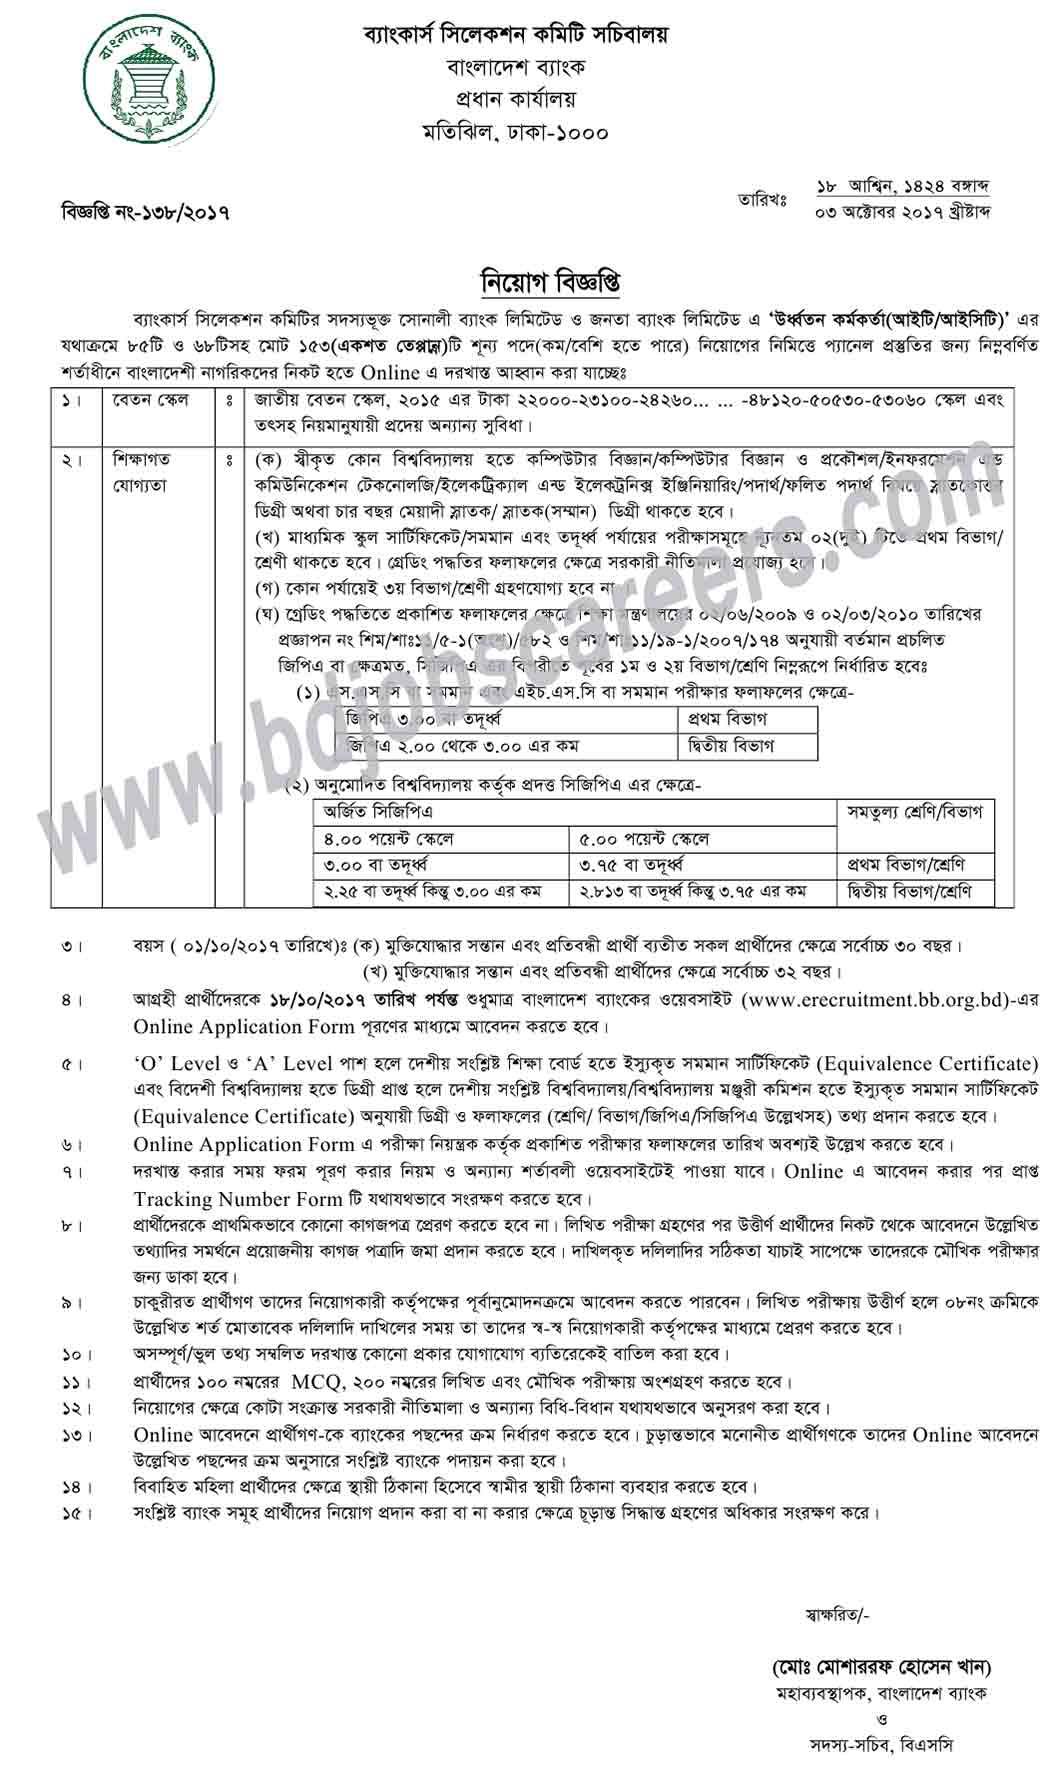 Janata Bank Job Circular 2017Janata Bank Job Circular 2017